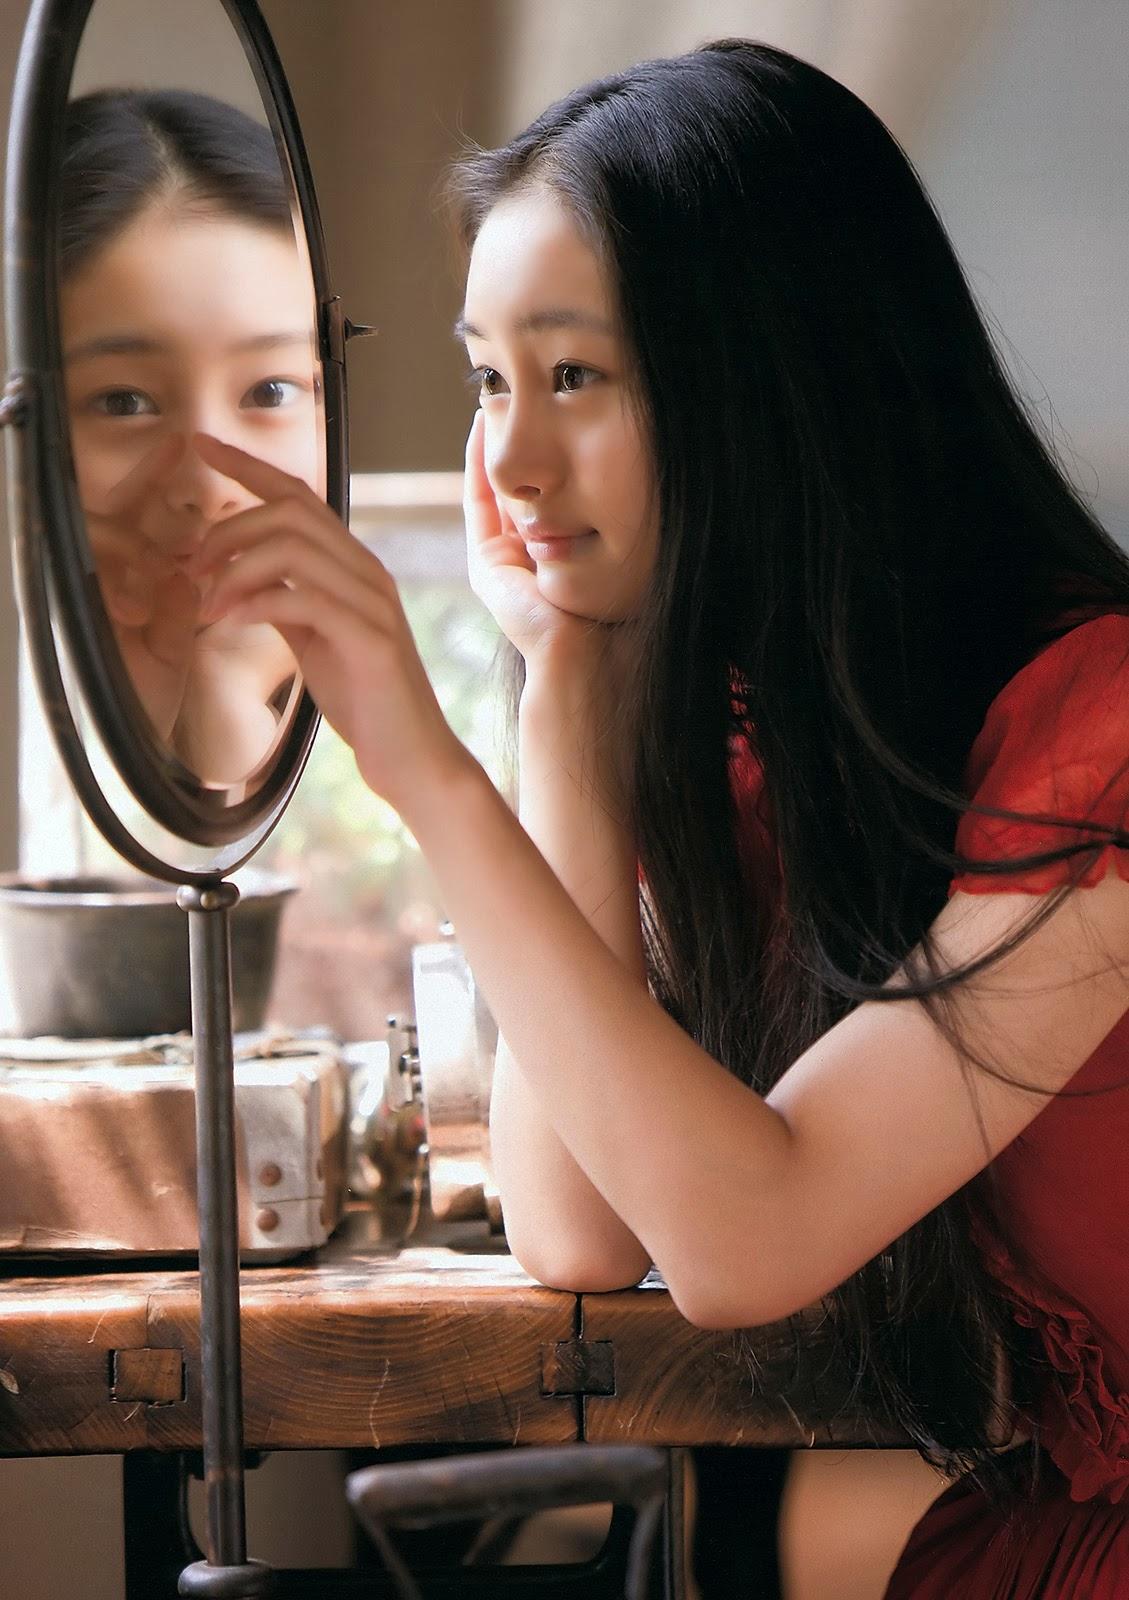 Kutsuna Shiori 忽那汐里 Weekly Playboy No 11 2012 Pictures 2